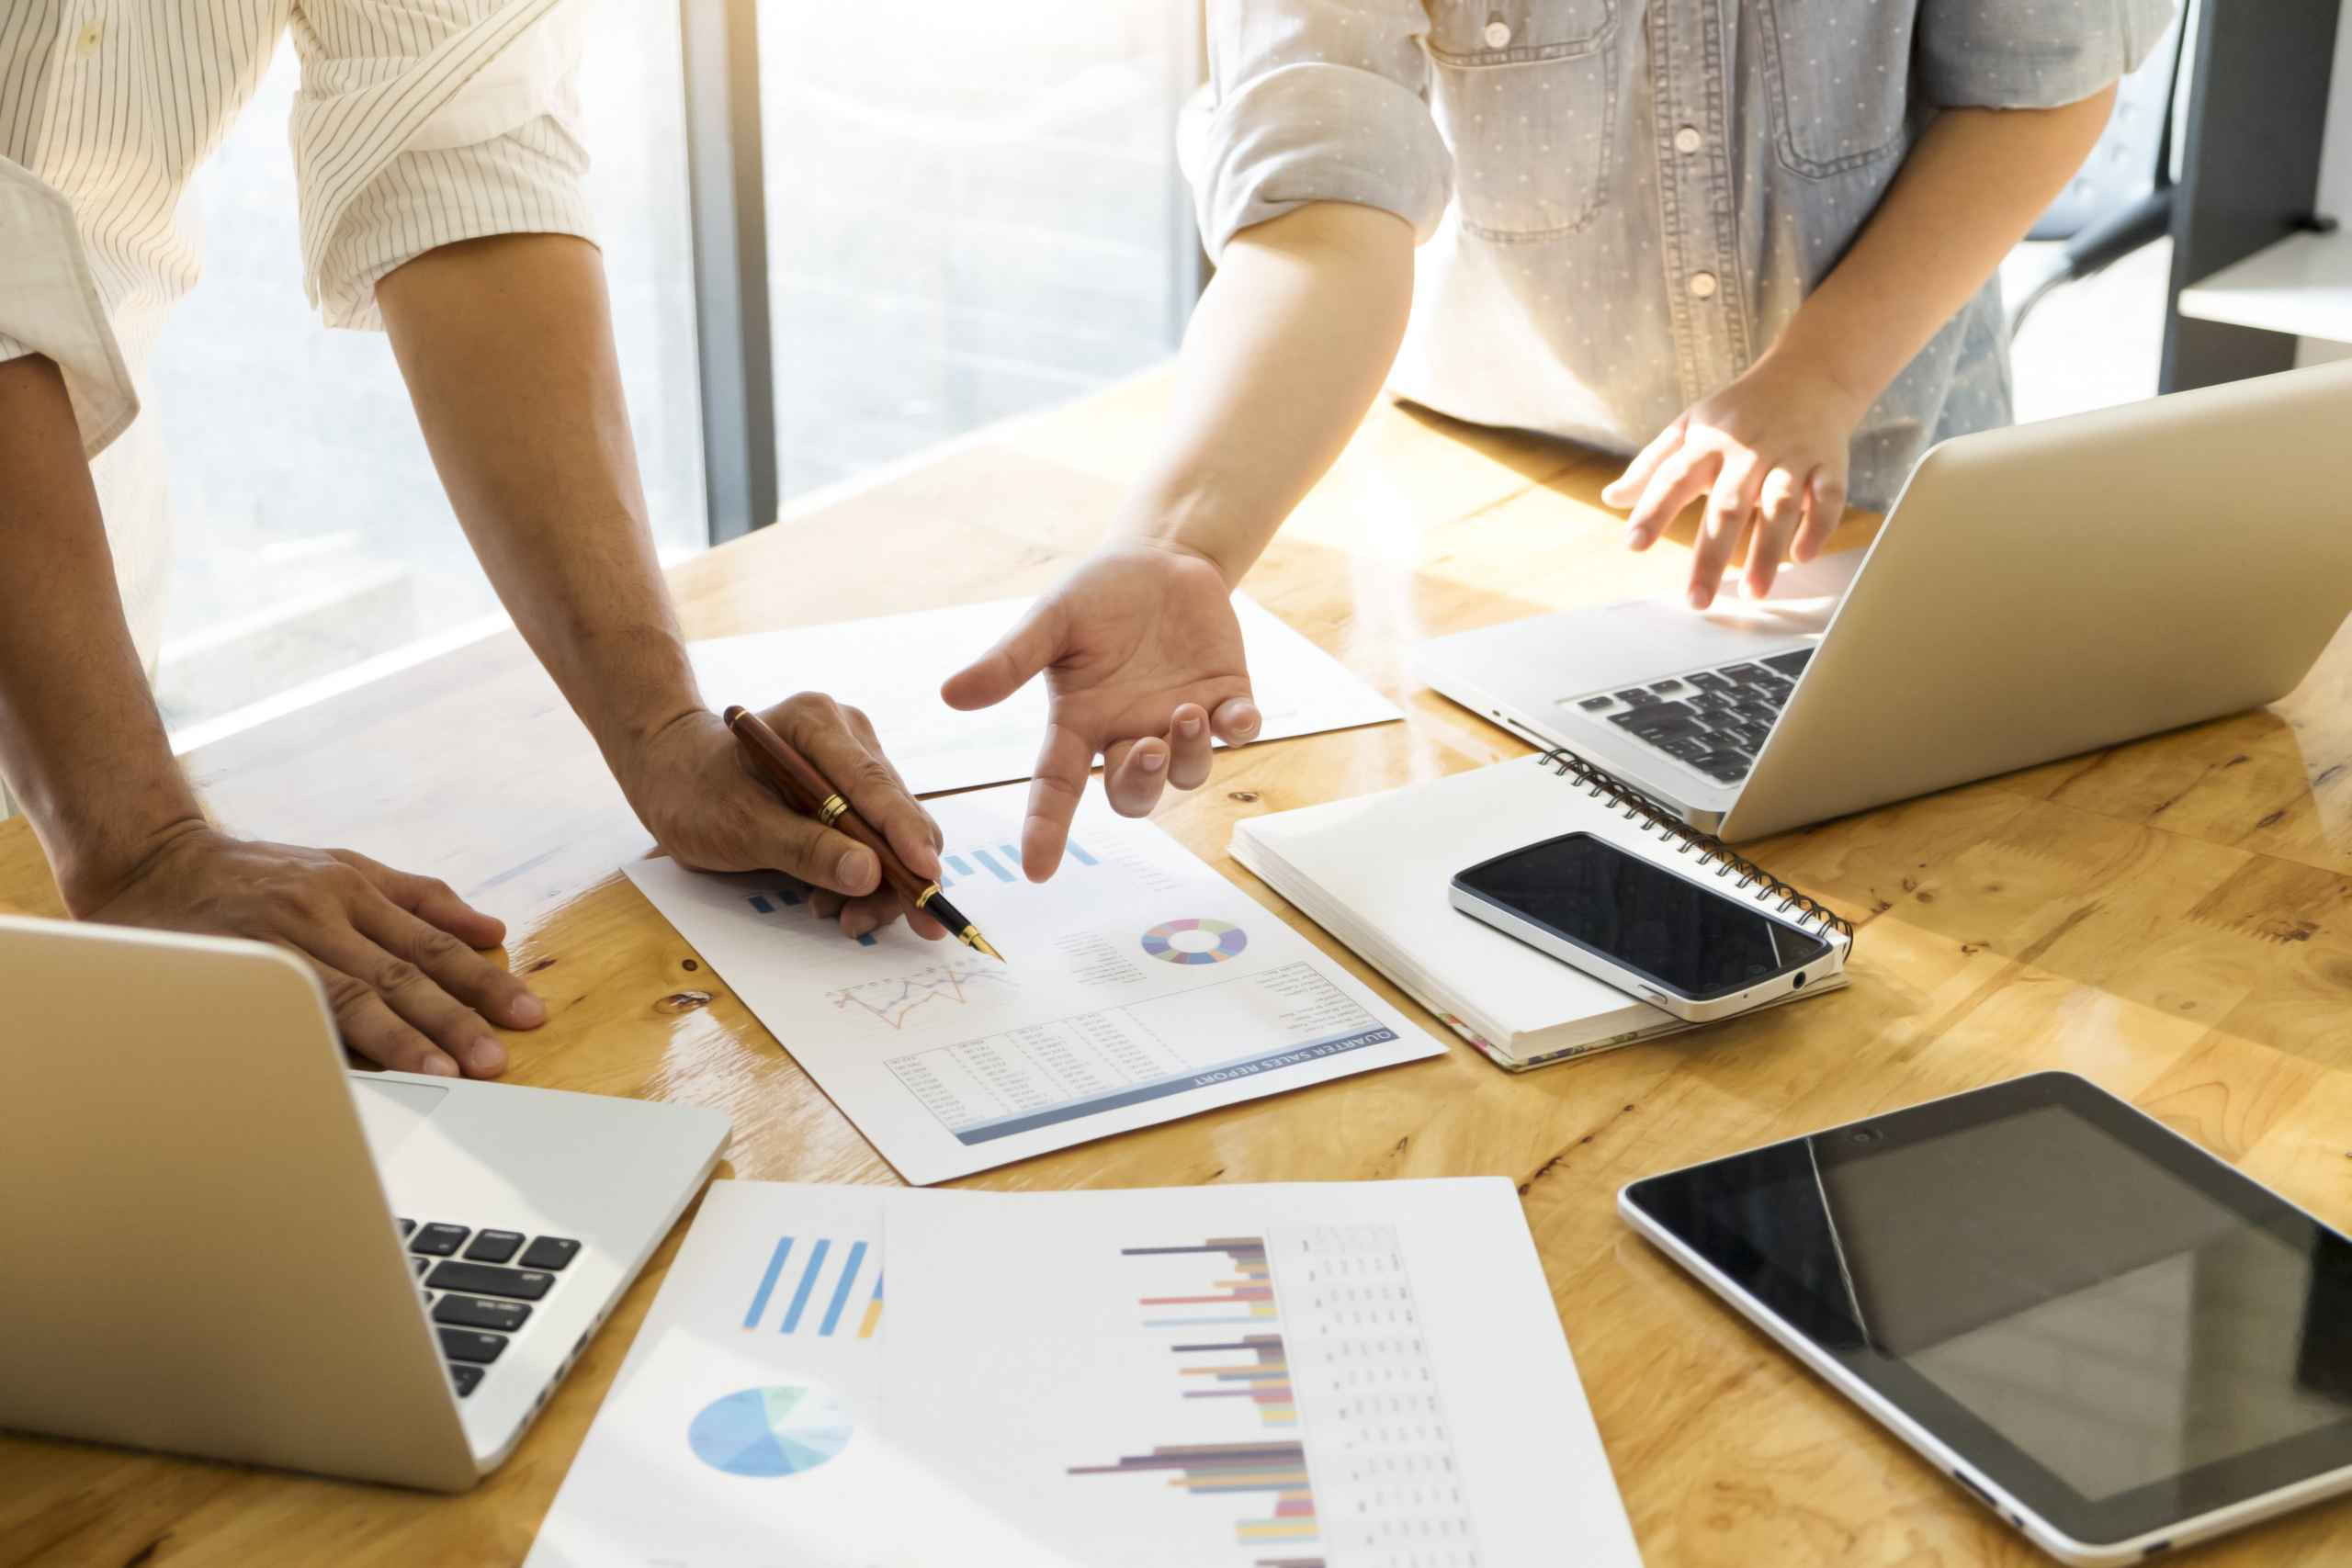 key performance metrics and data